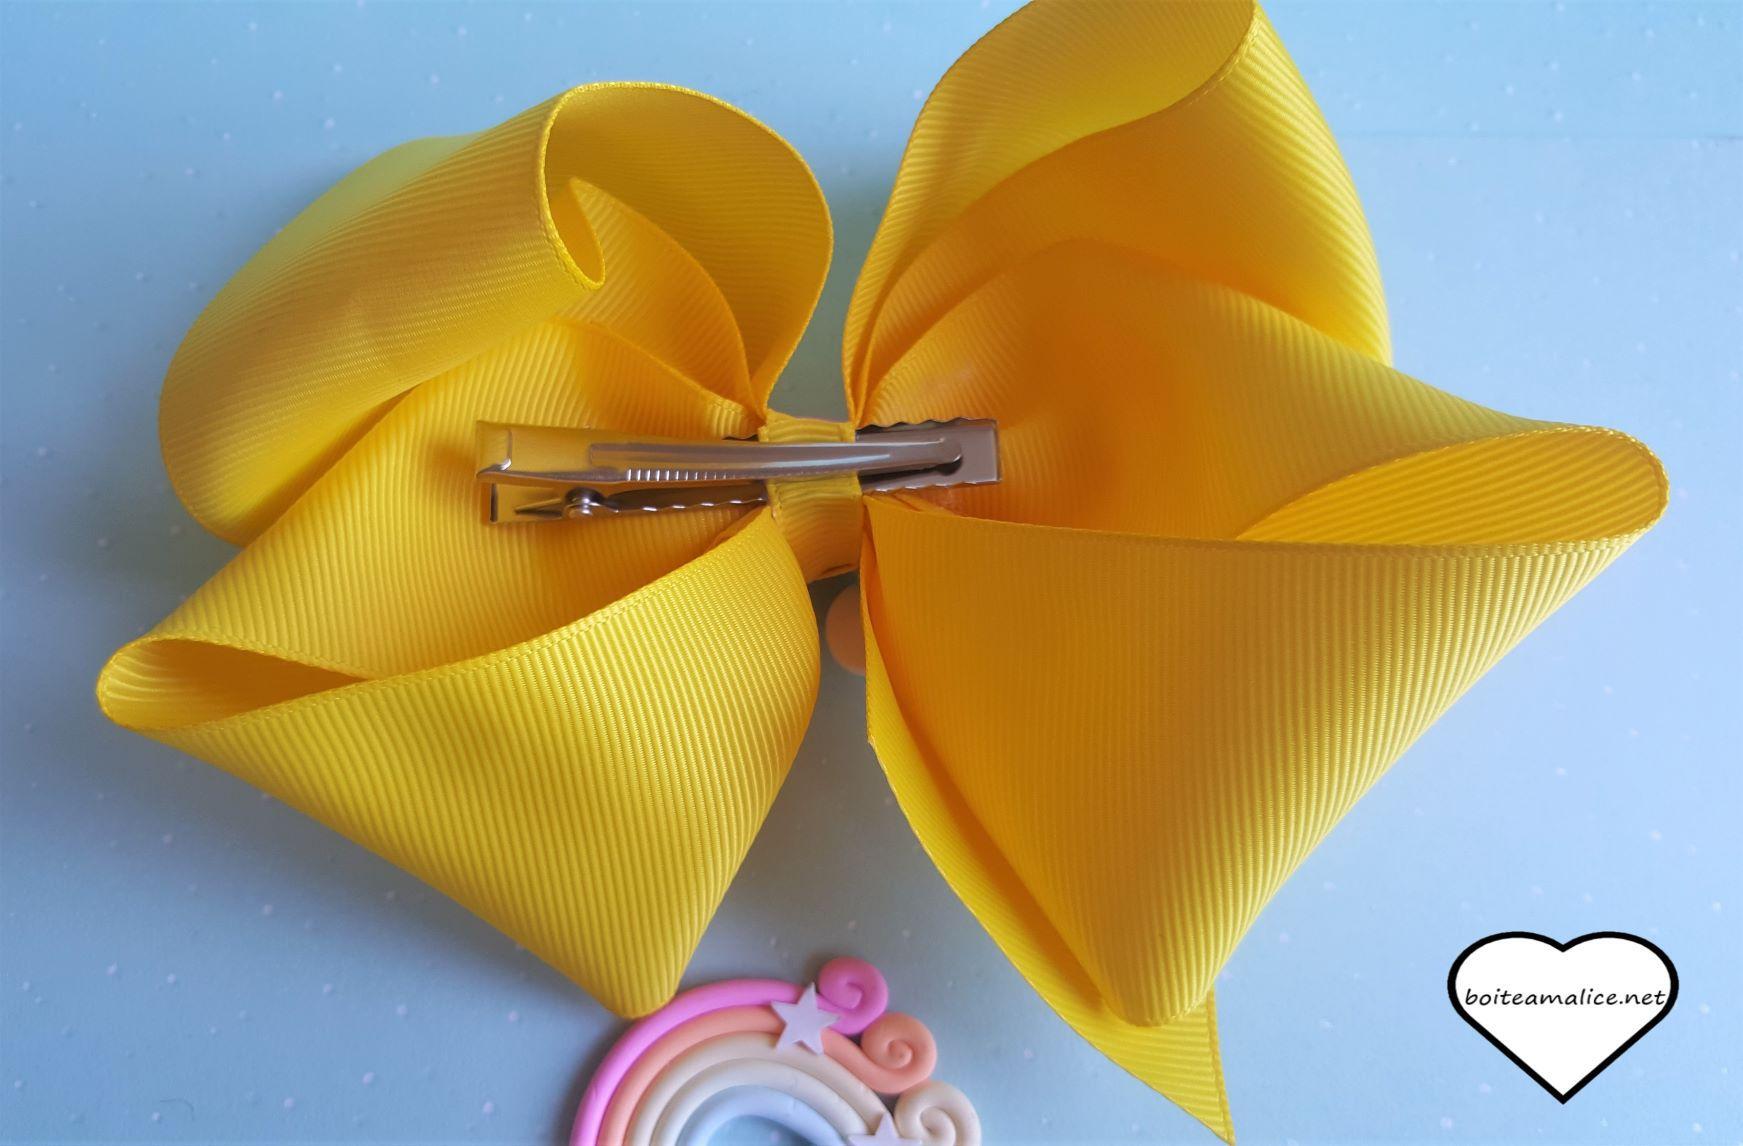 Grosse barrette jaune